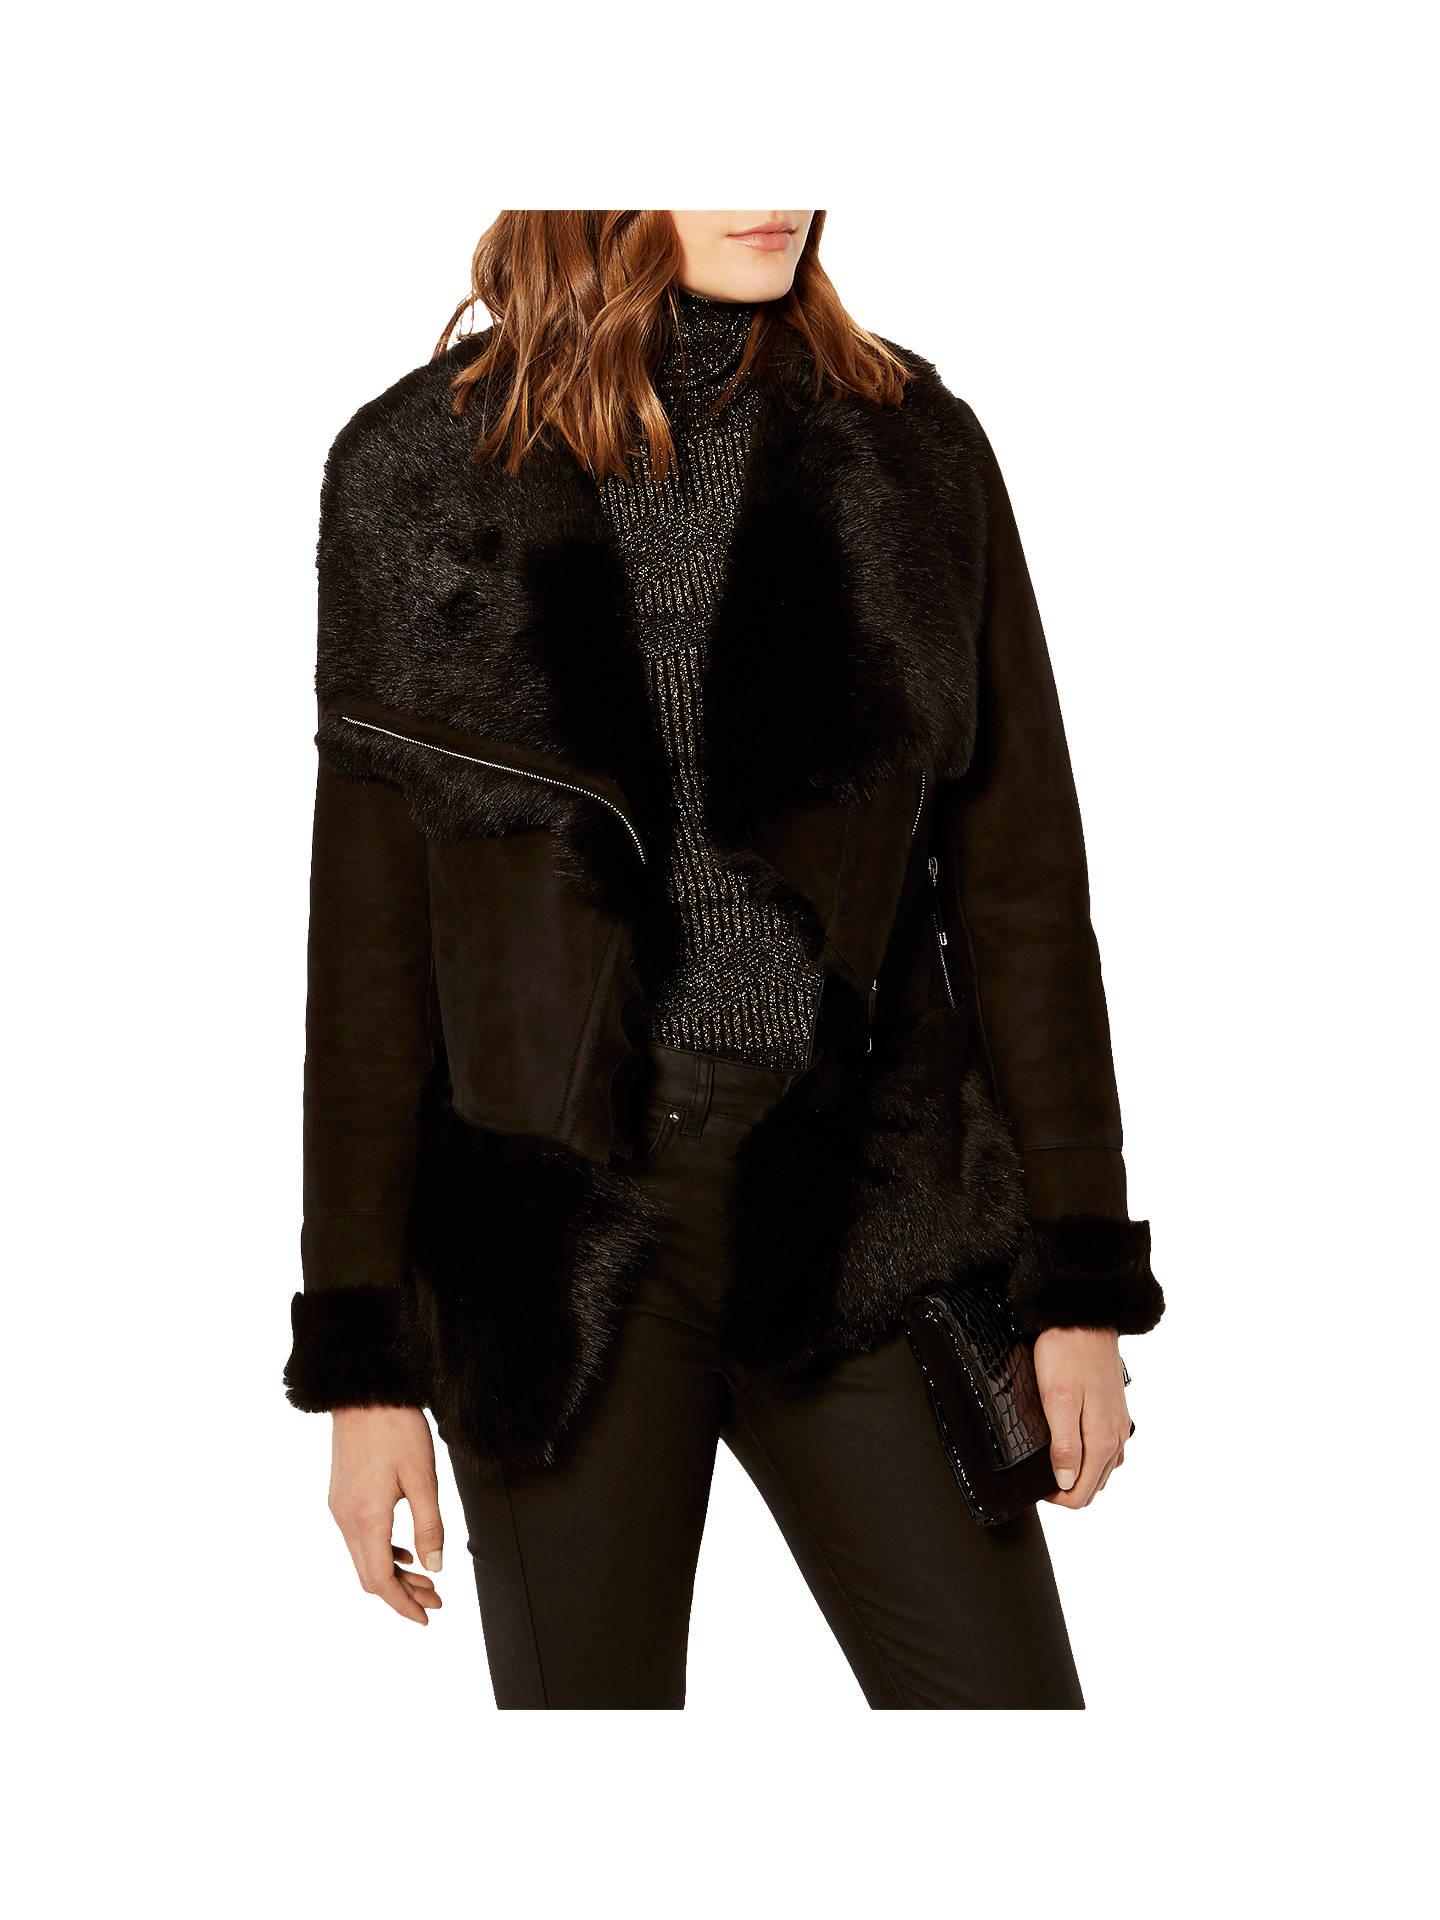 51a7e9314c3 Buy Karen Millen Luxury Shearling Leather Jacket, Black, 6 Online at  johnlewis.com ...